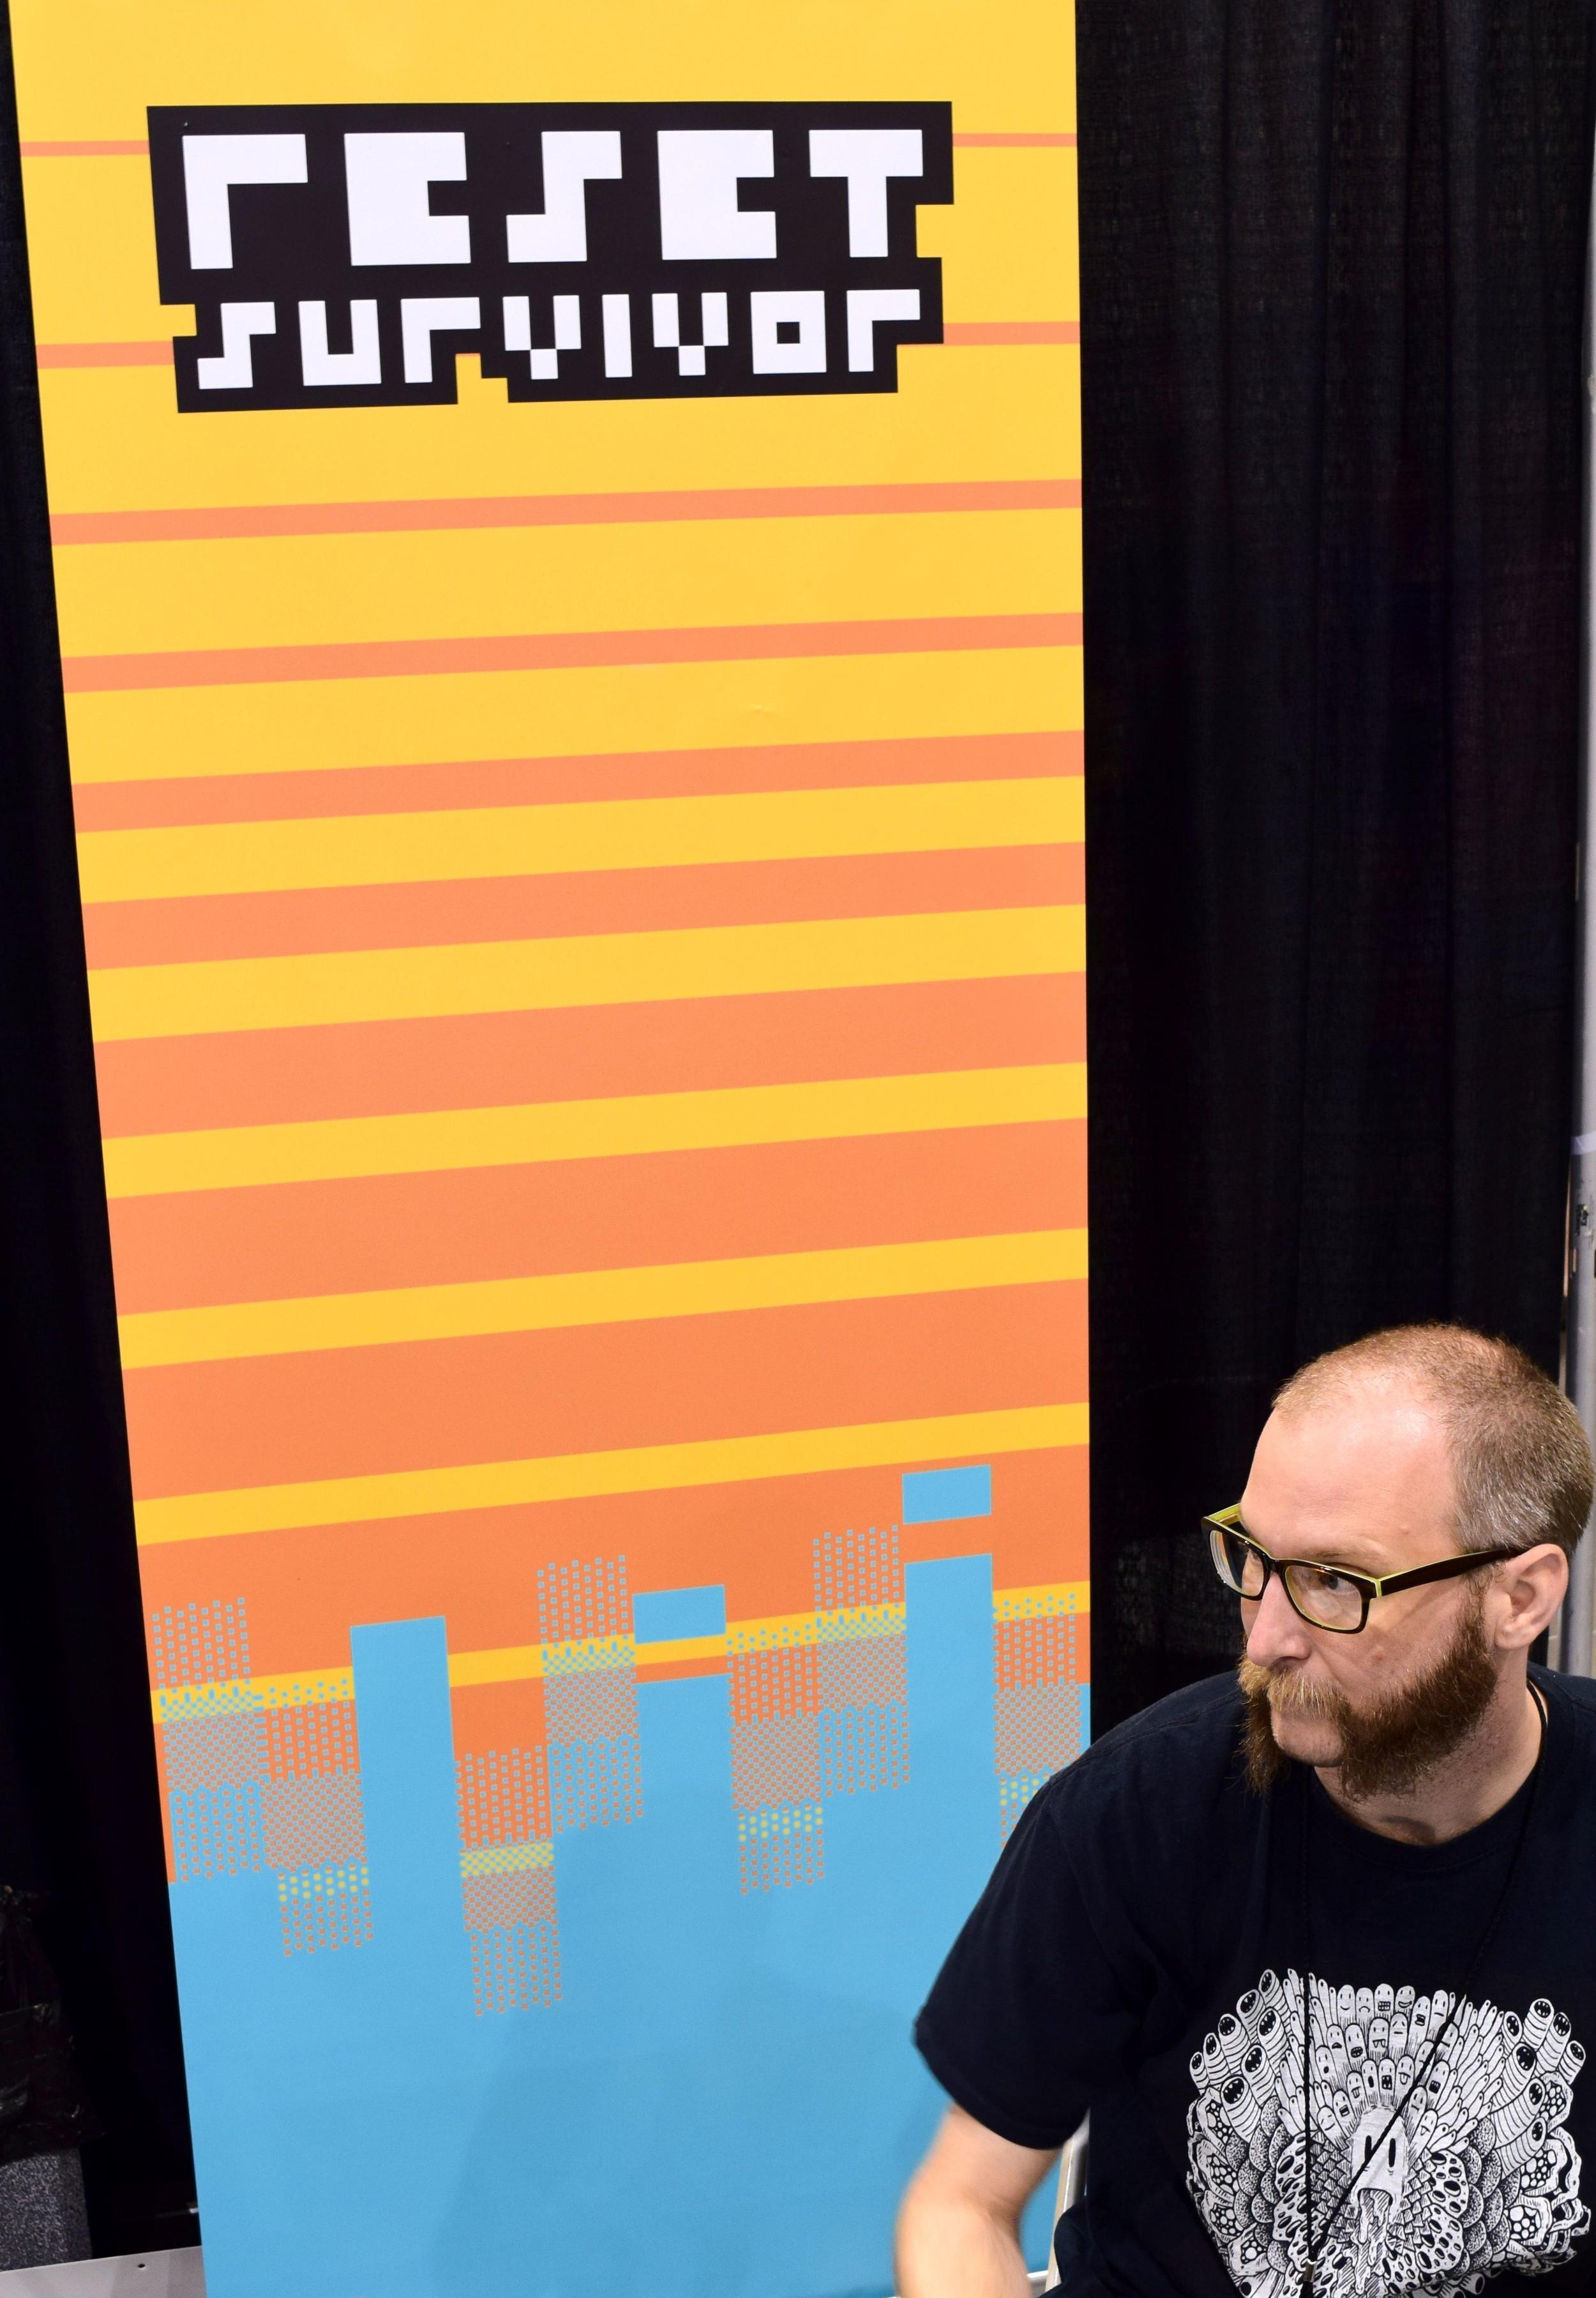 Reset Survivor and his banner at Phoenix Comic Con 2017.